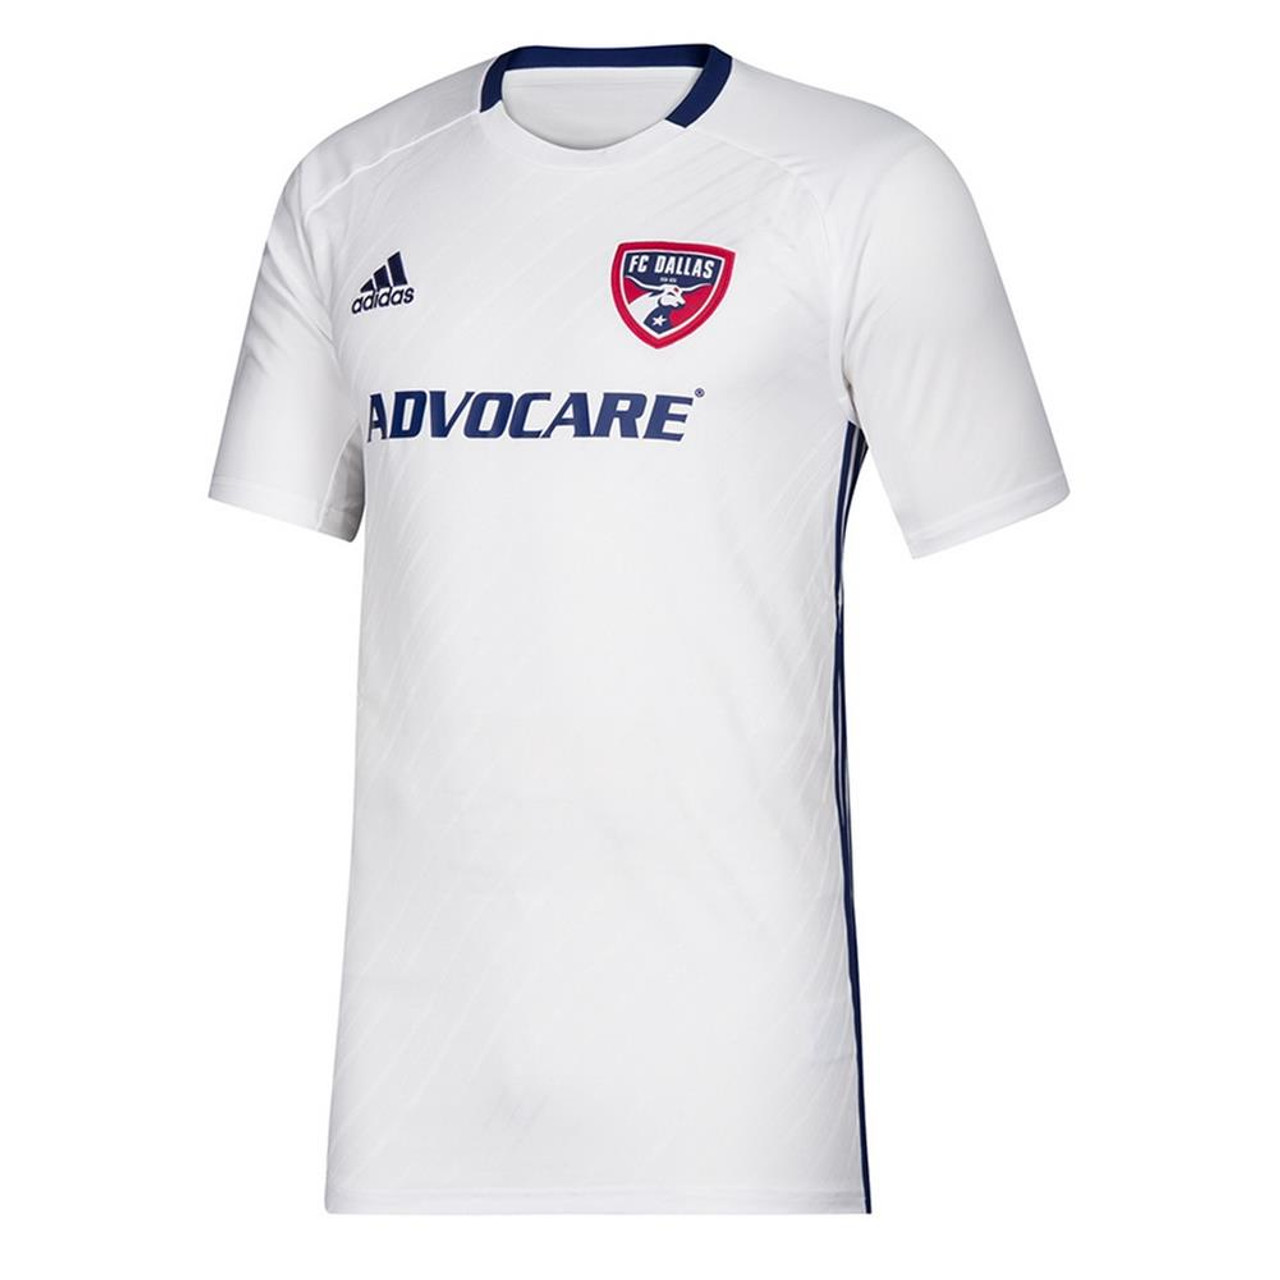 super popular 9d460 96c73 Men's FC Dallas Replica Jersey 2019 Adidas Away Kit